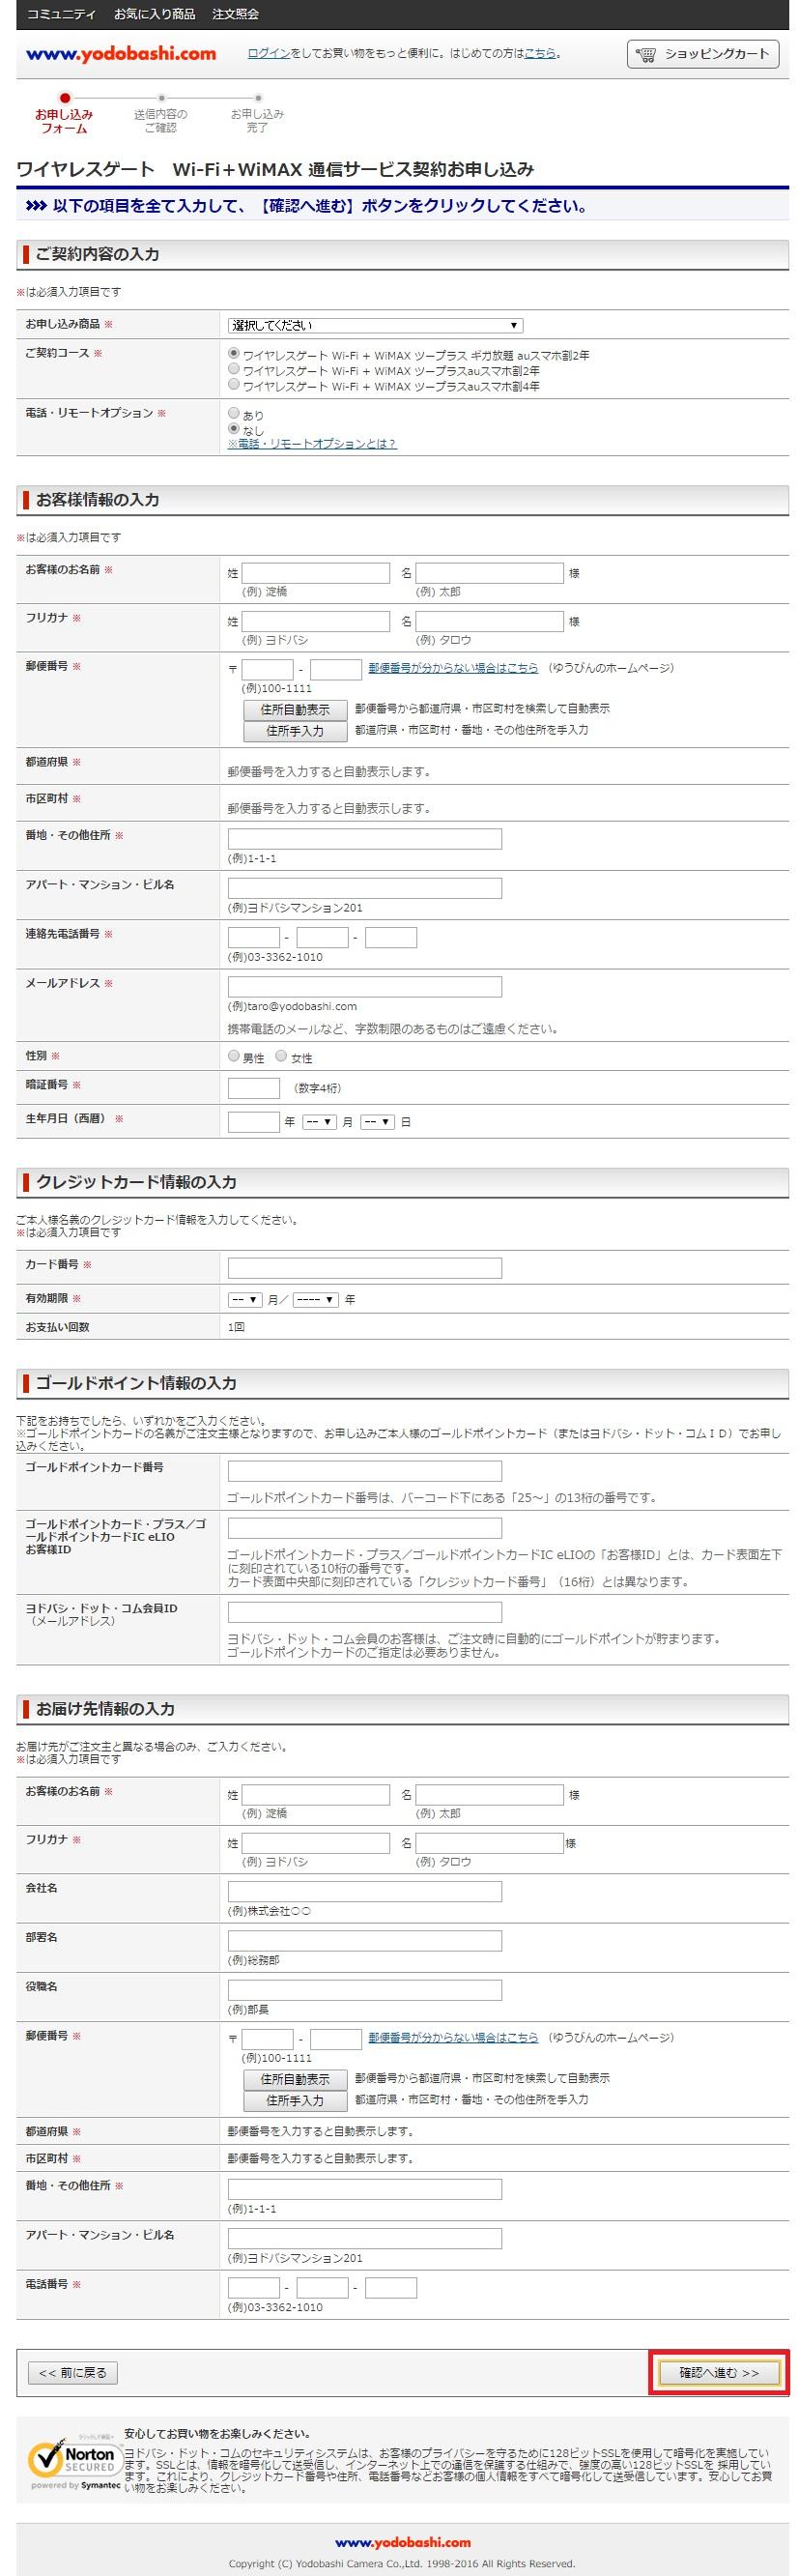 WiMAXマスターヨドバシWiMAX契約方法と手順32016年8月11日